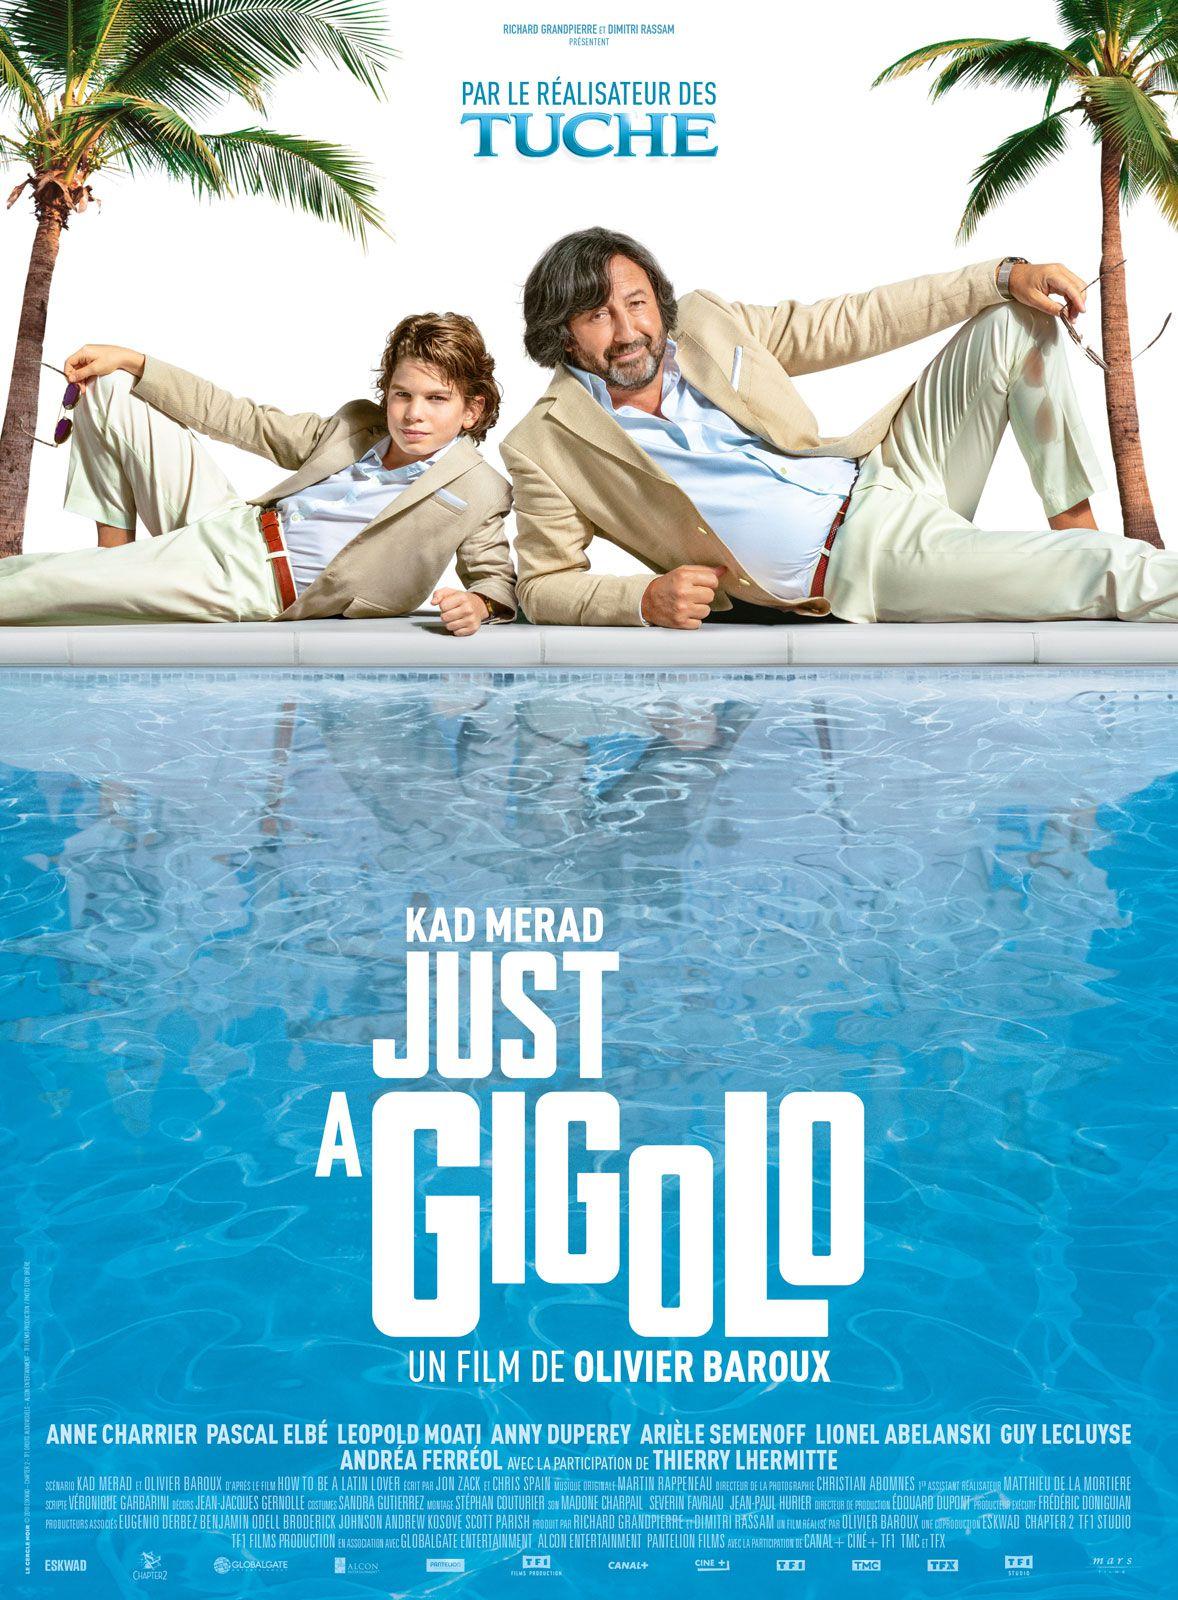 Just a Gigolo - Film (2019)